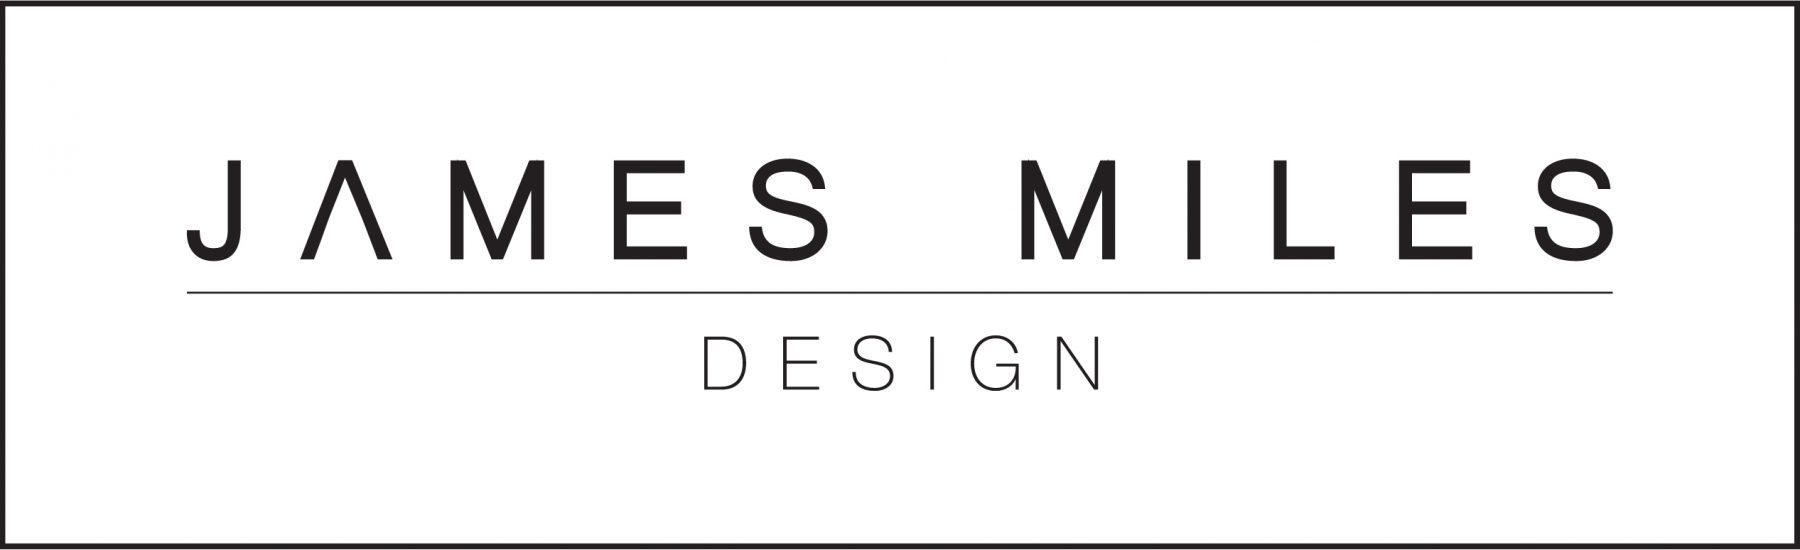 James Miles Design